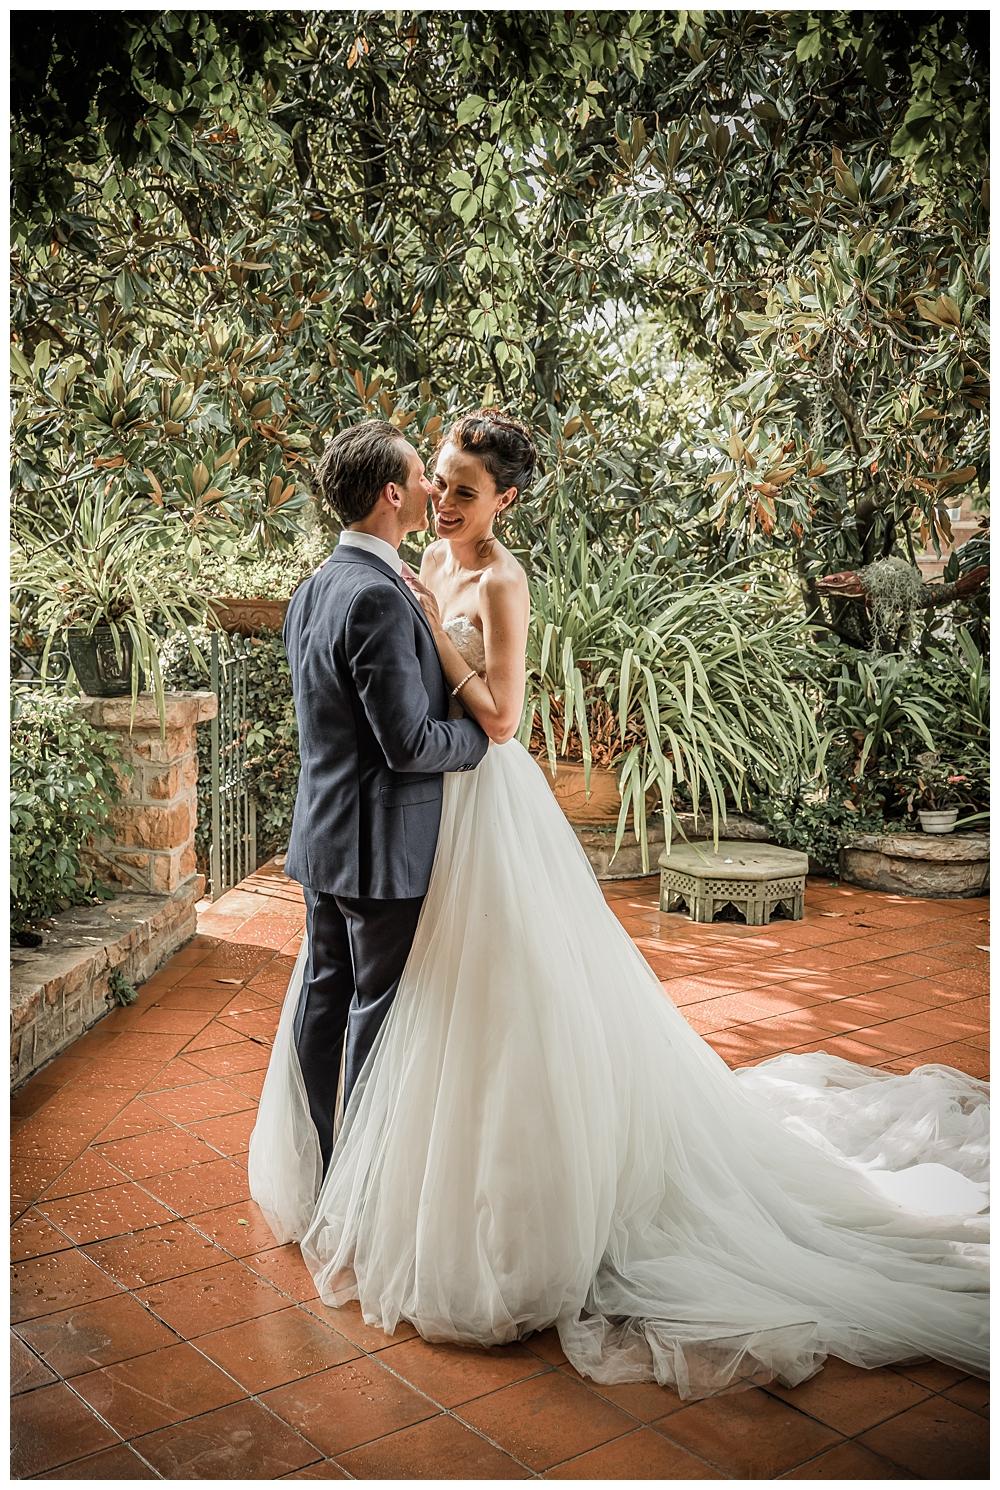 Best_Wedding_Photographer_AlexanderSmith_1286.jpg